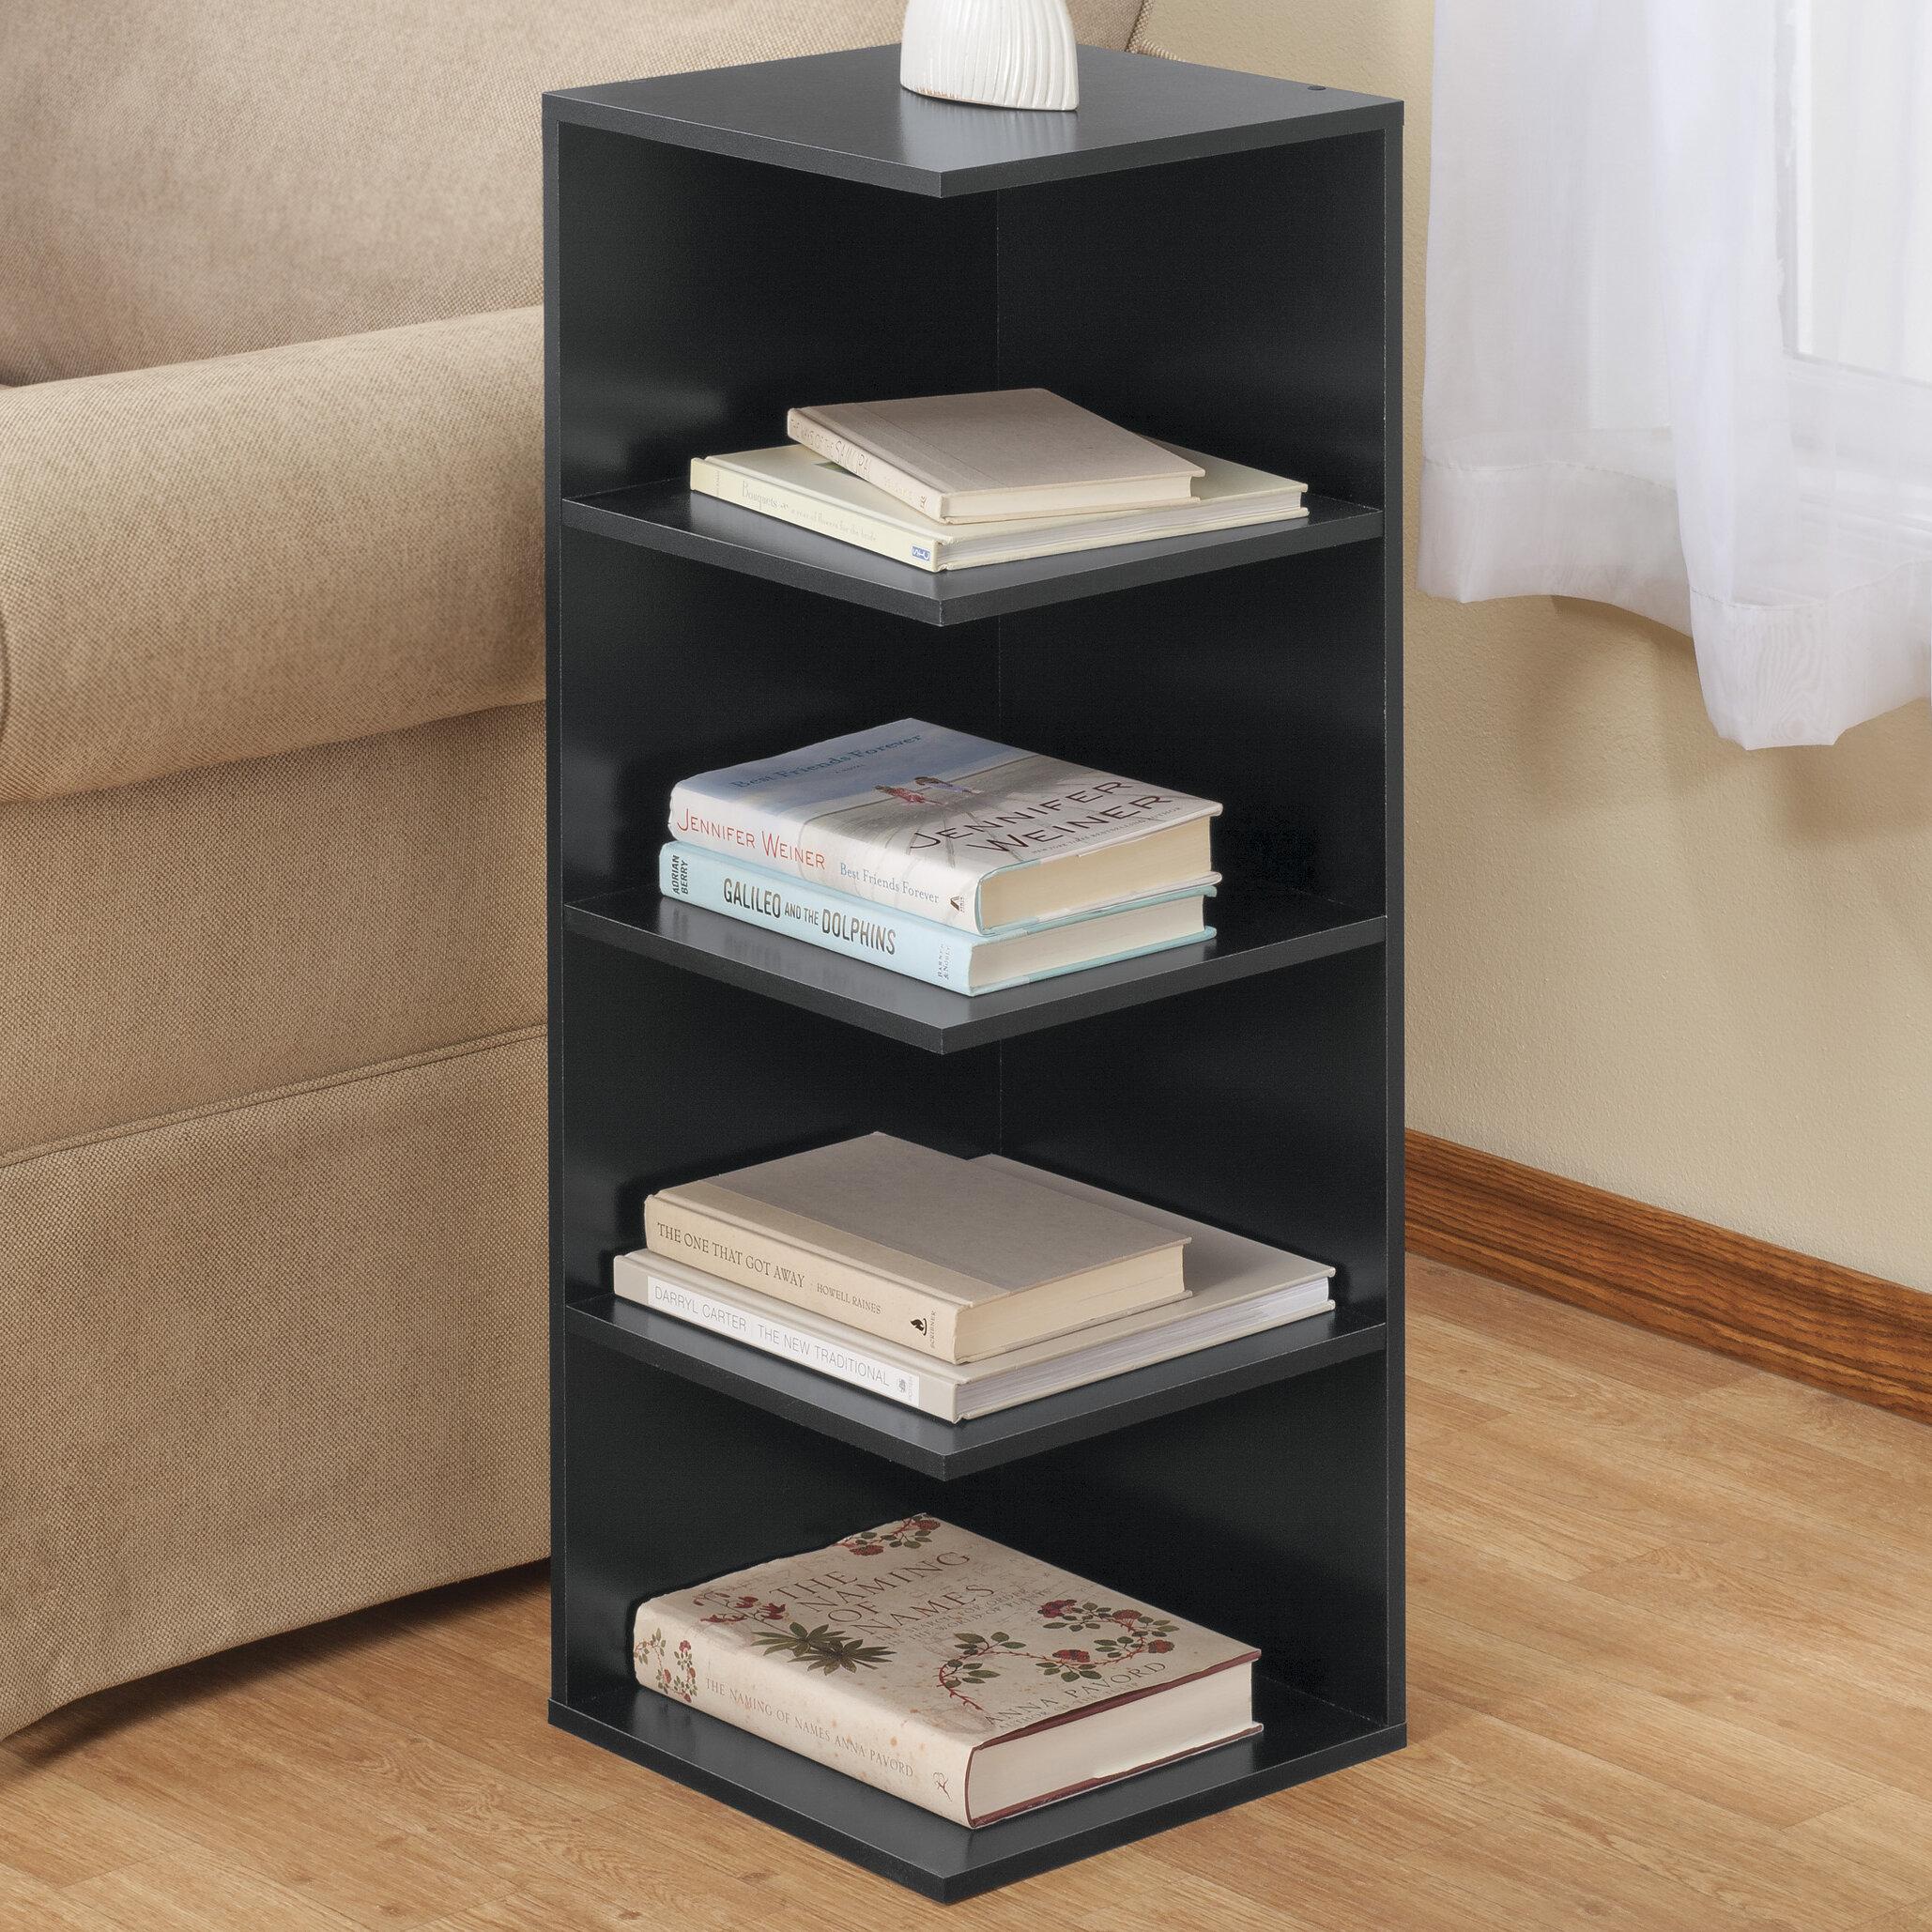 Miles Kimball Readeru0027S Stand Corner Unit Bookcase | Wayfair